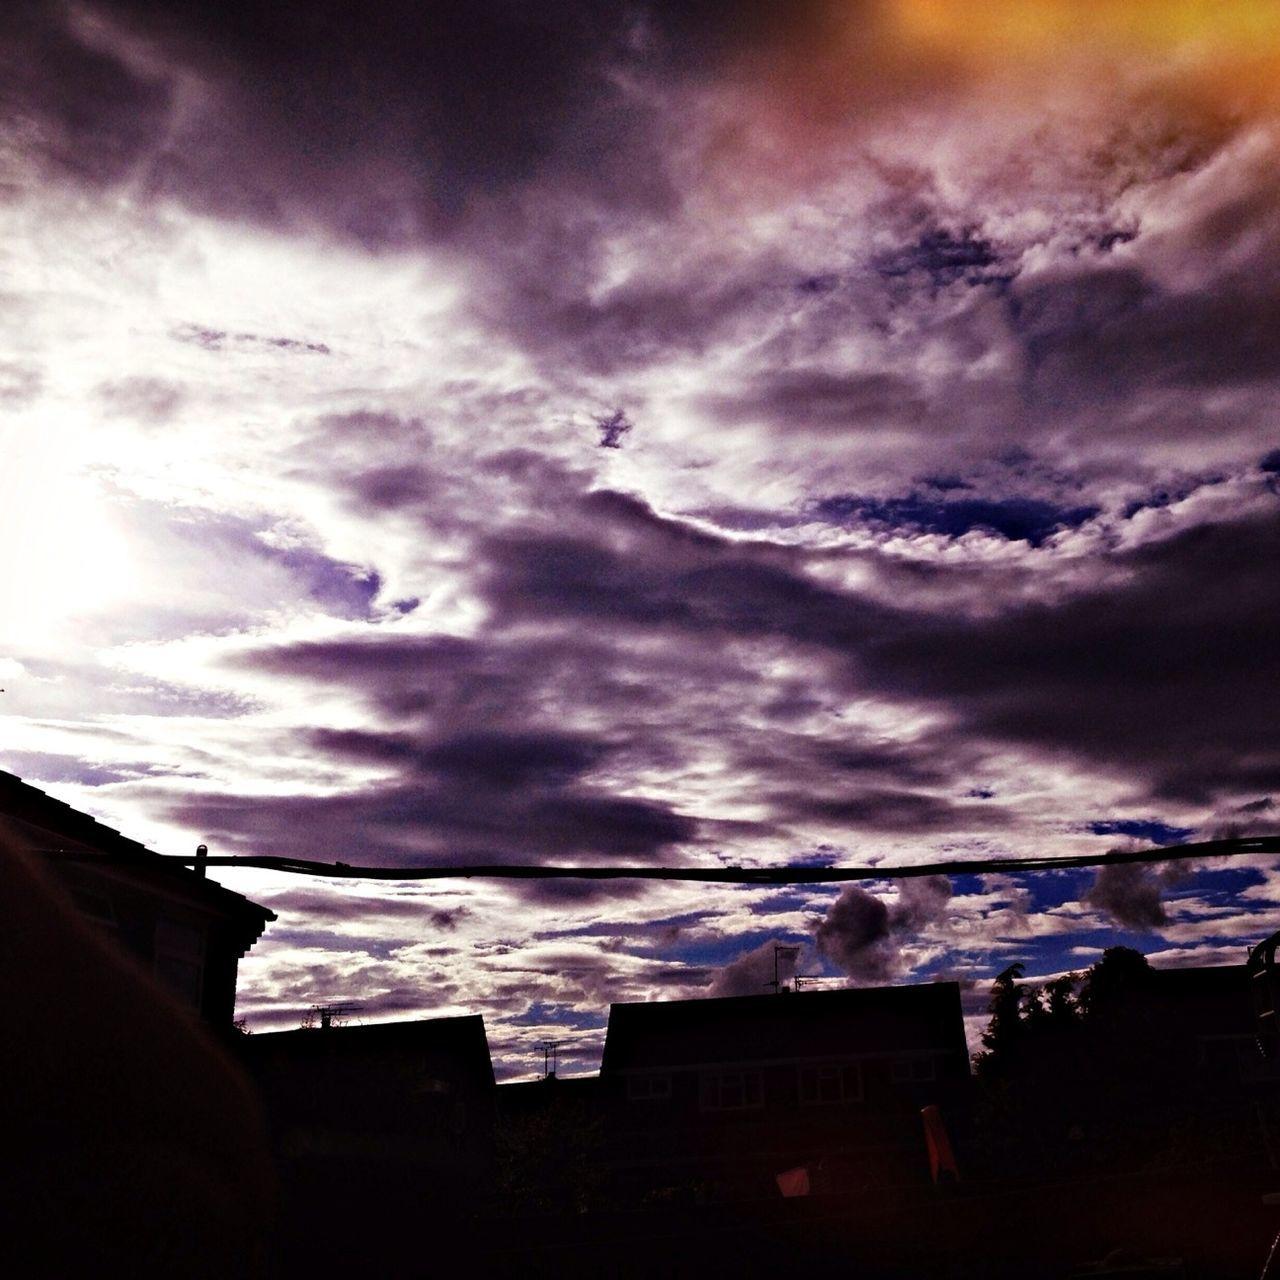 #sunset #sun #clouds #skylovers #sky #nature #beautifulinnature #naturalbeauty #photography #landscape EyeEm Best Shots - Sunsets + Sunrise My Sky Obsession... Shot From My Garden